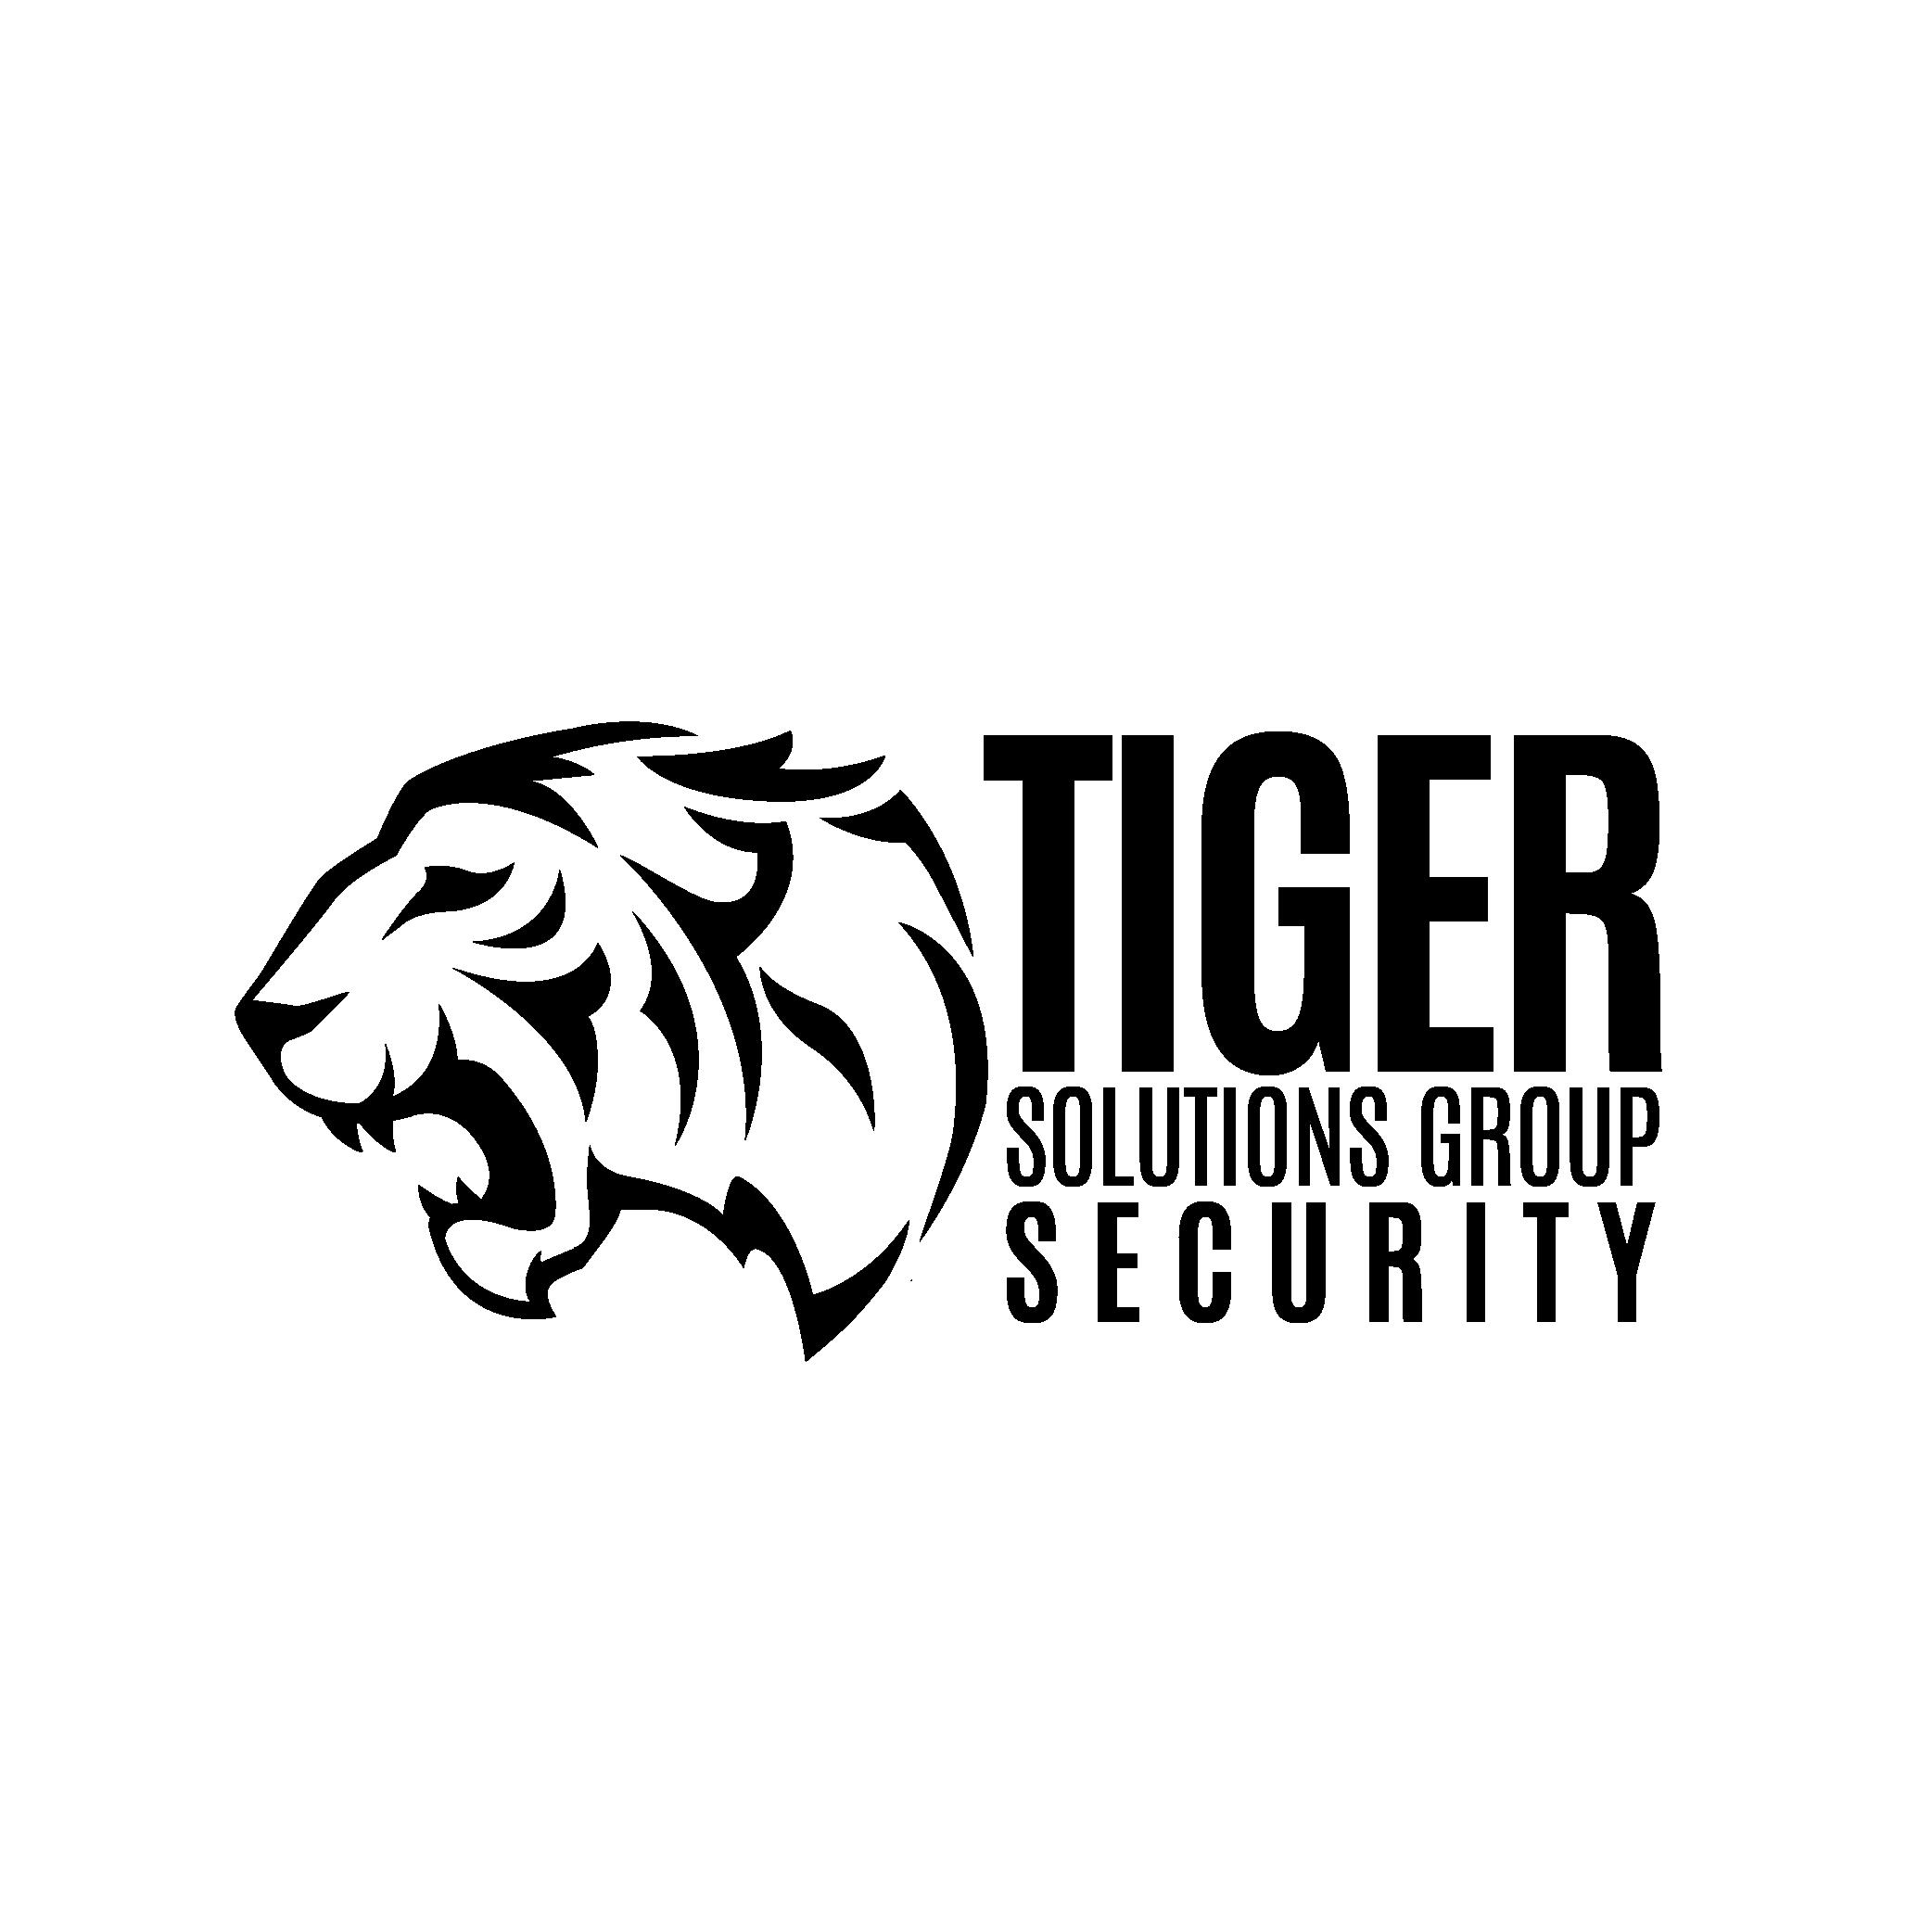 TSGSLogosBW-01 (002)